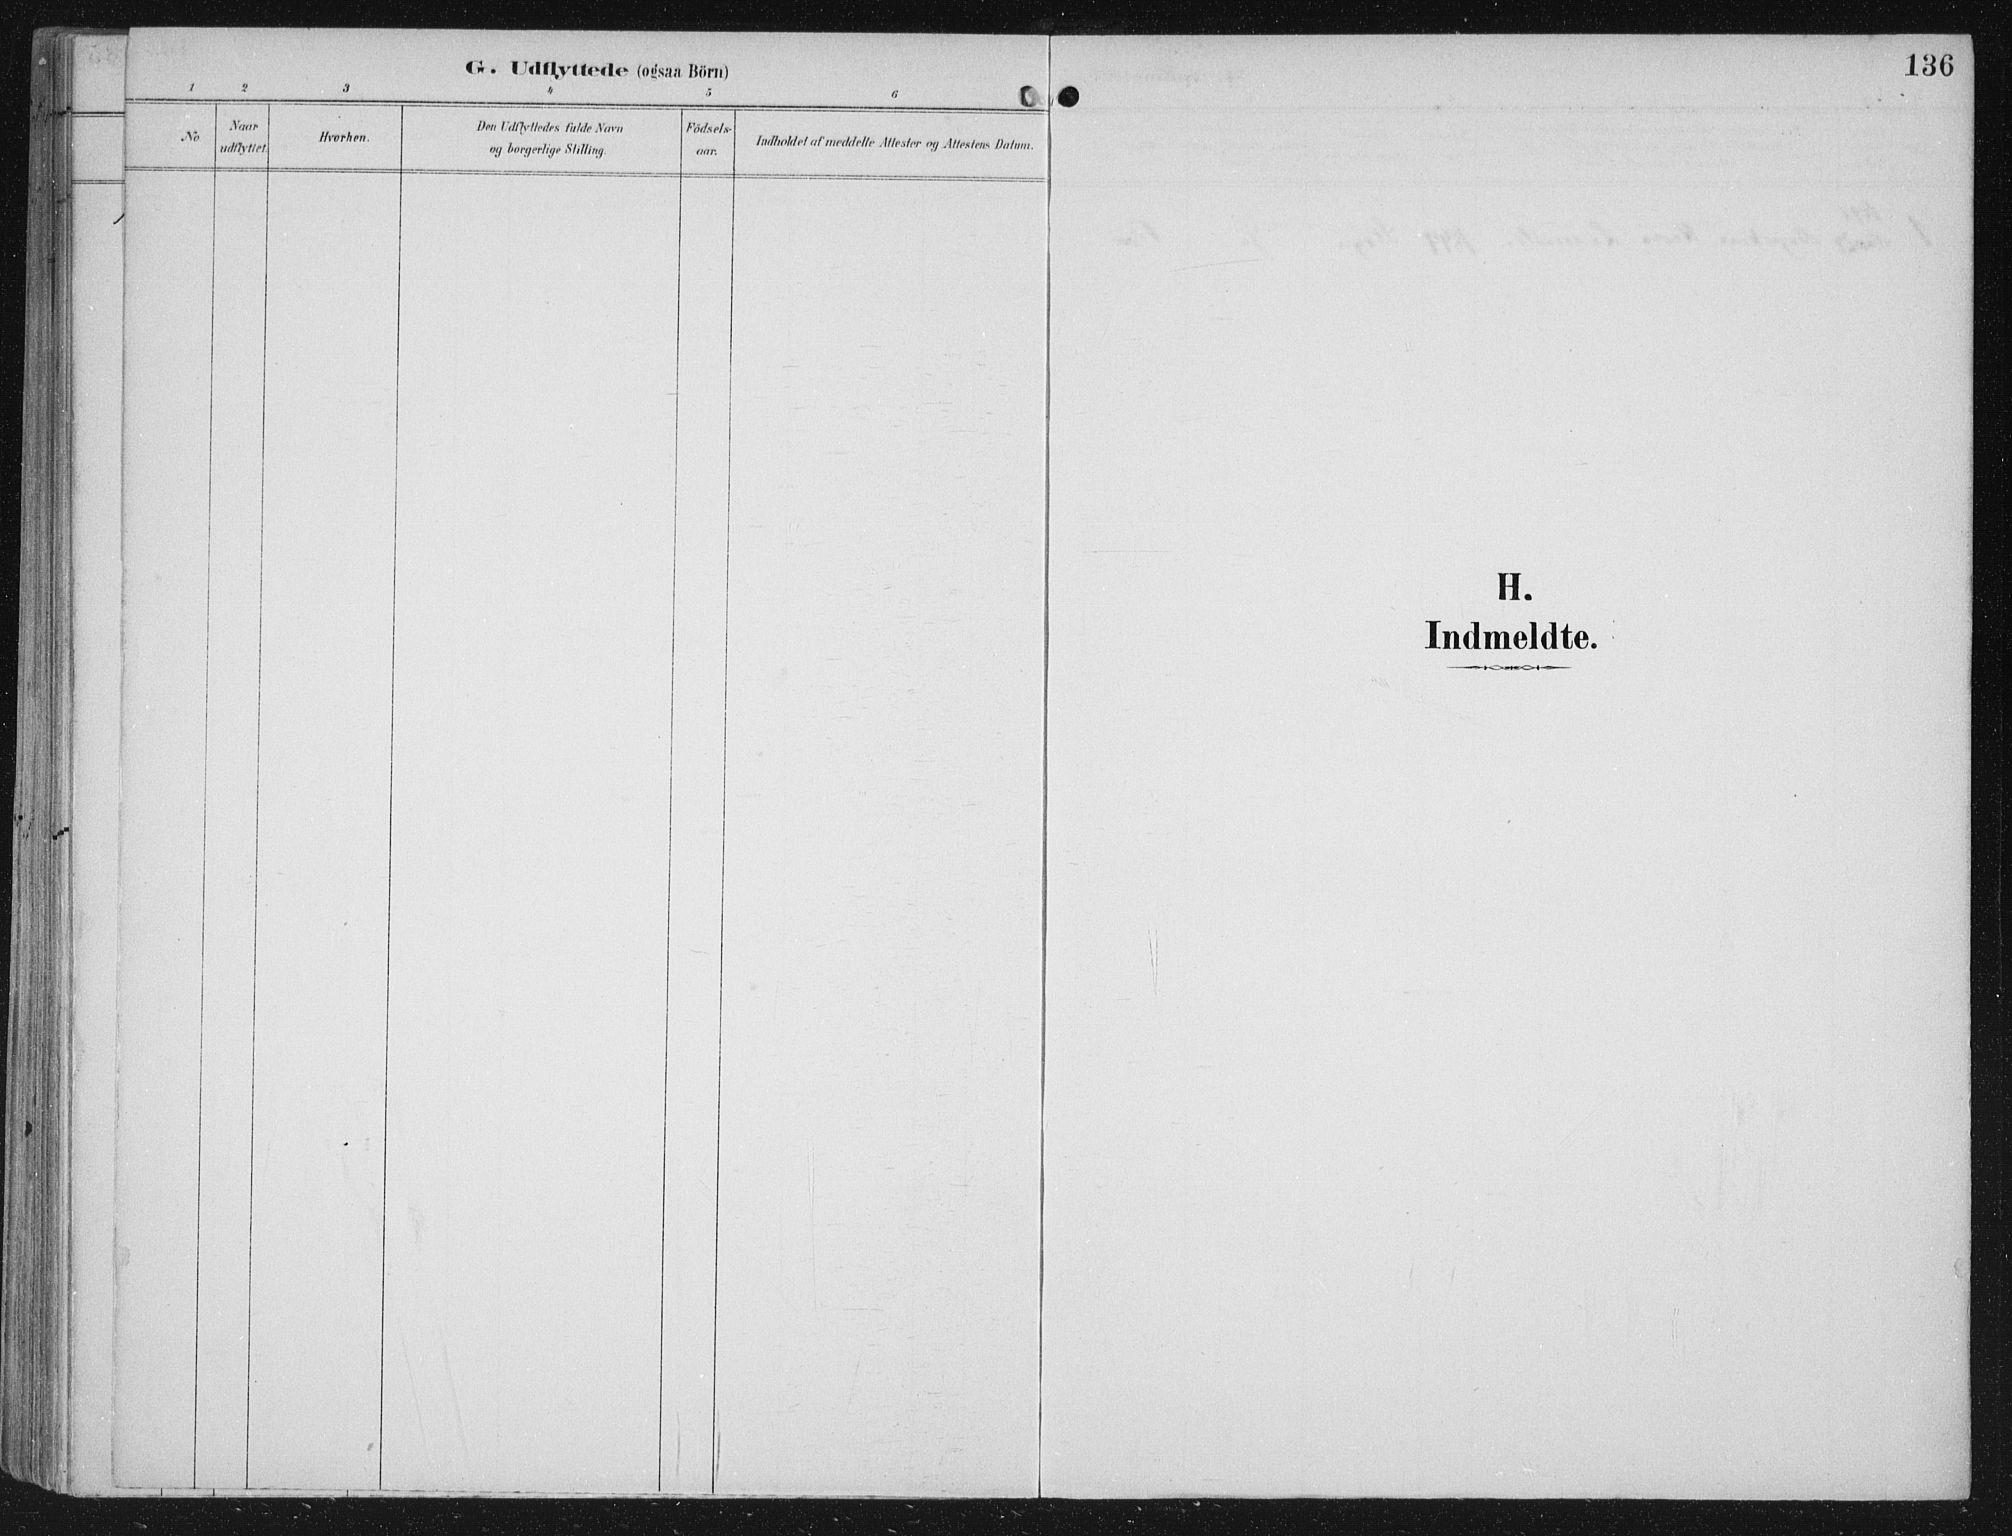 SAB, Kinn sokneprestembete, H/Haa/Haac/L0002: Ministerialbok nr. C  2, 1895-1916, s. 136